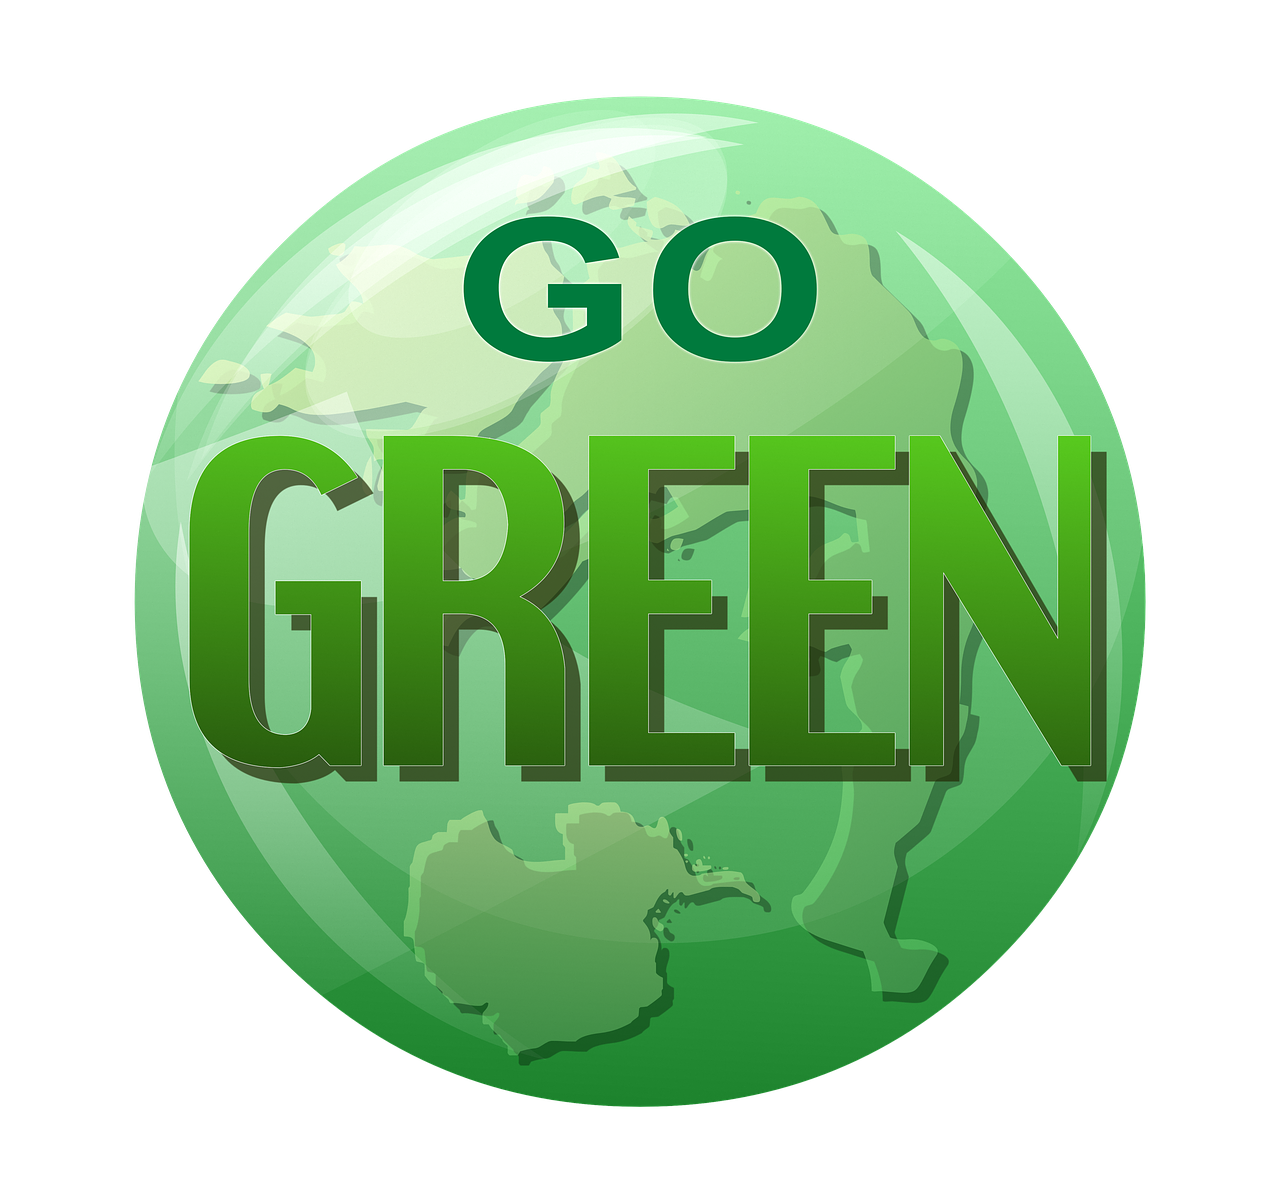 green-1357925_1280